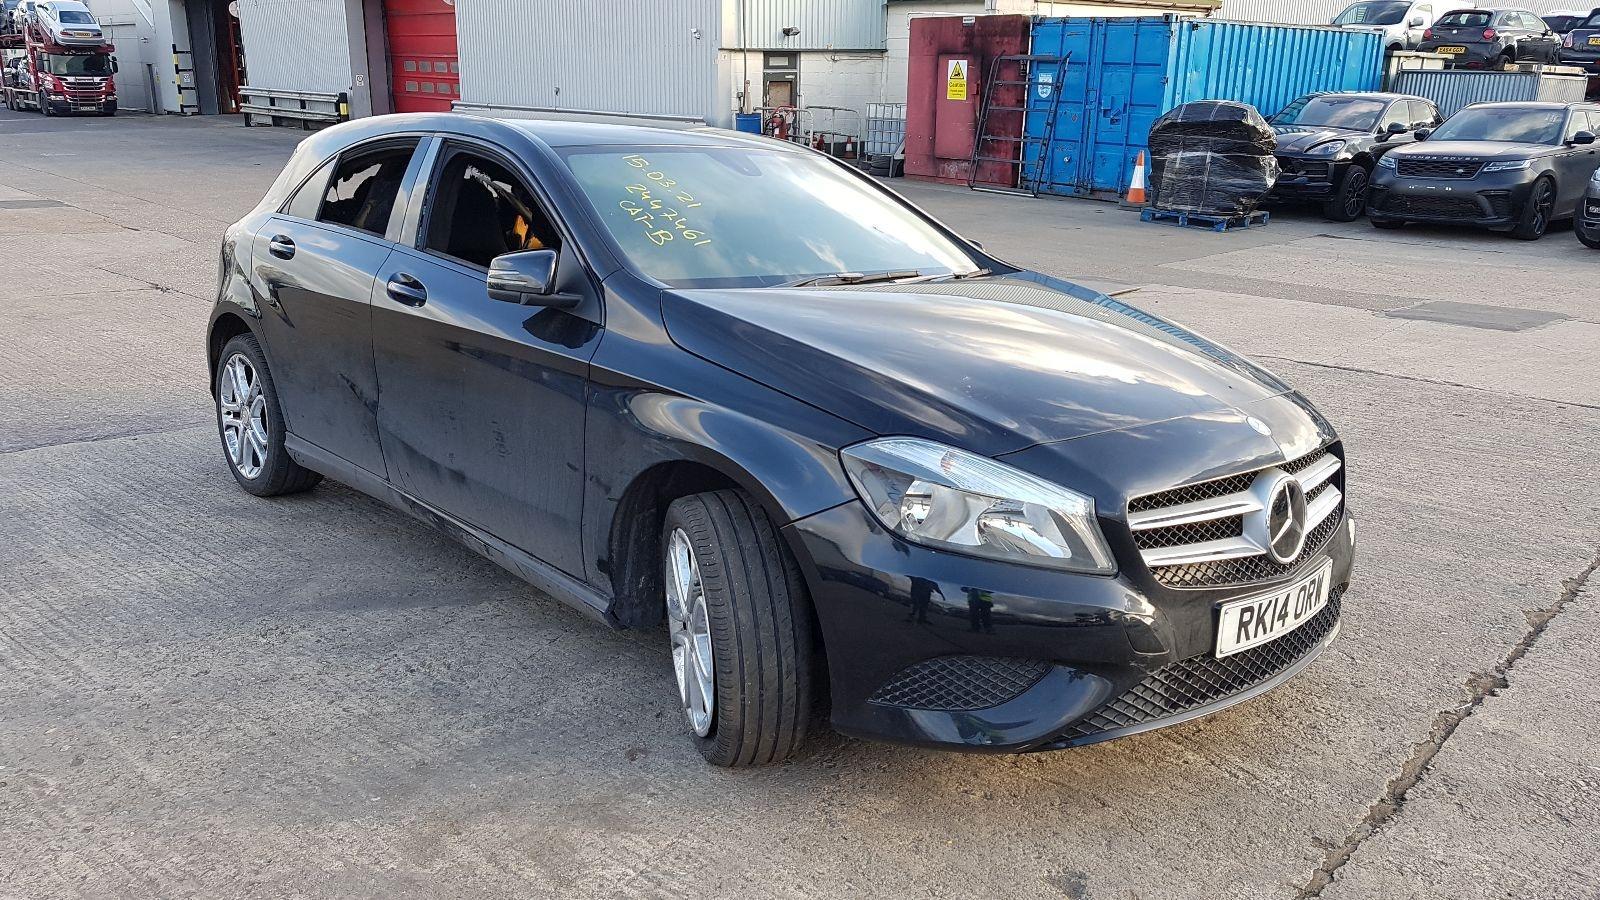 Image for a Mercedes A Class 2014 5 Door Hatchback Breaking